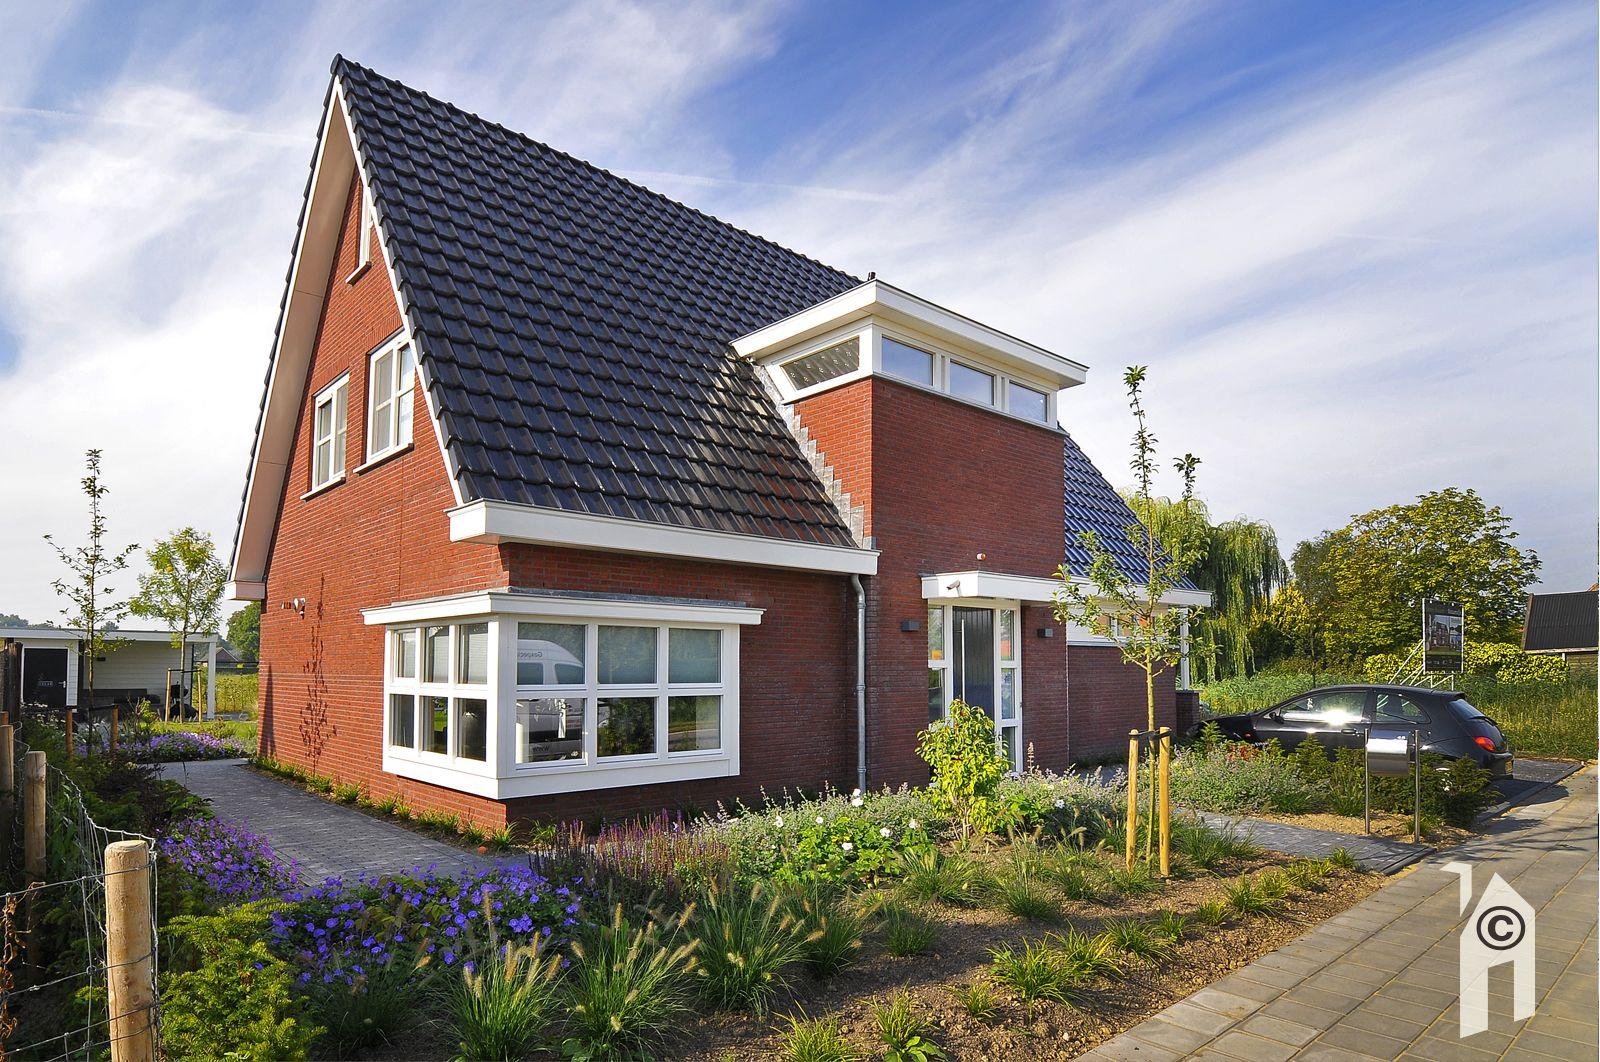 Fabulous huizen moderne stijl with huizen moderne stijl for Huizen moderne stijl